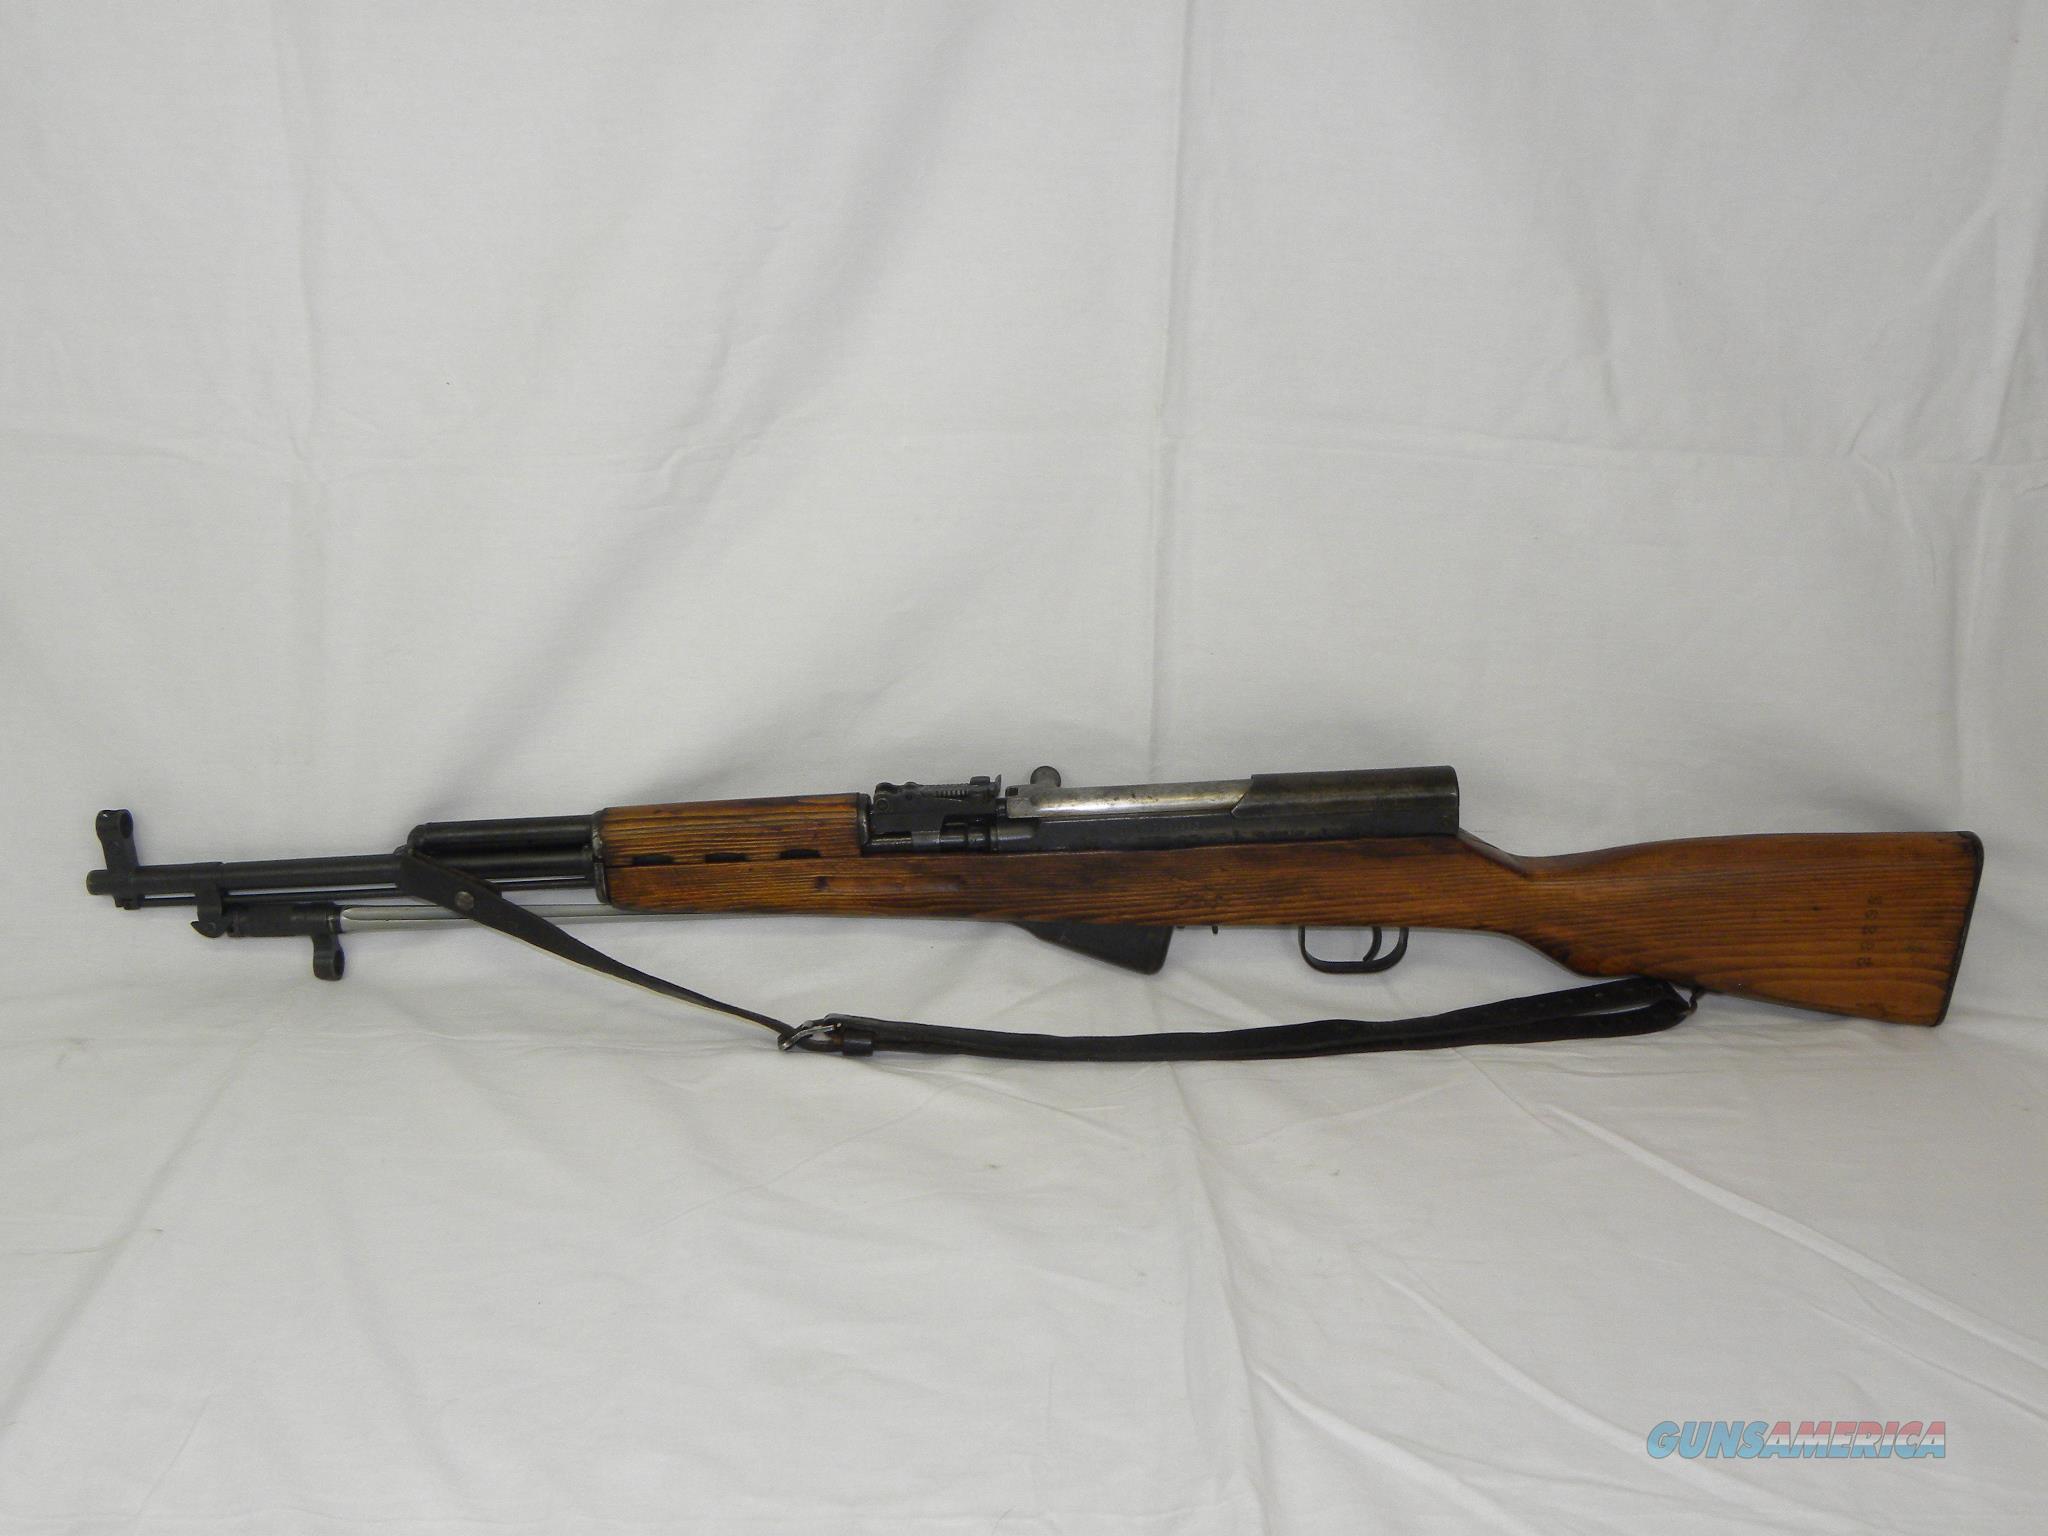 Norinco SKS all matching numbers  Guns > Rifles > SKS Rifles